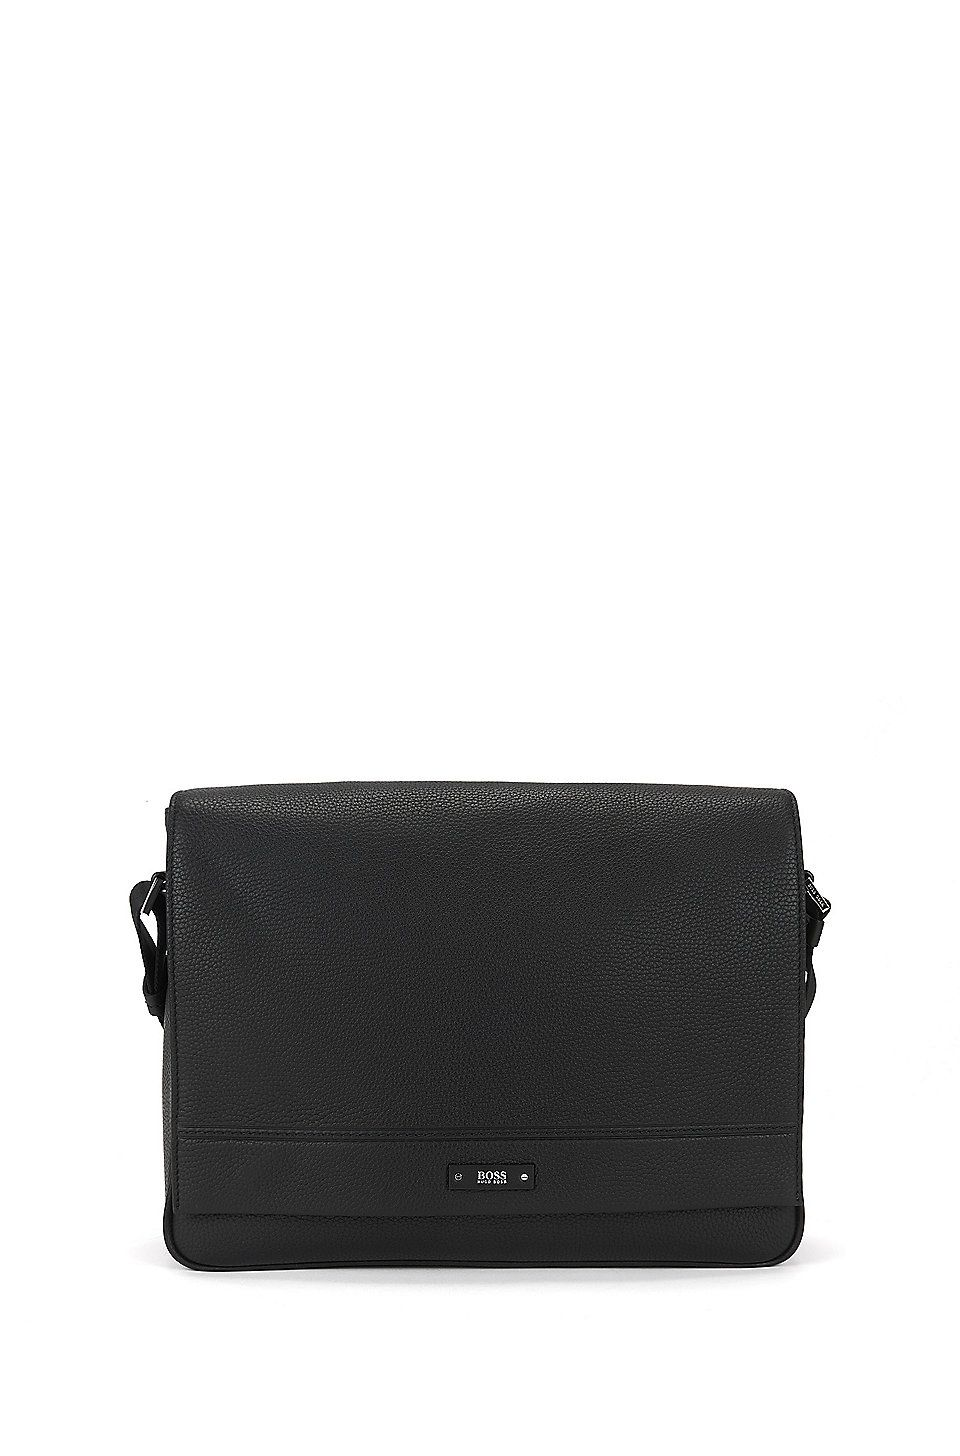 f6b93ad15 HUGO BOSS Messenger bag in soft grained leather - Black Shoulder bags from  BOSS for Men